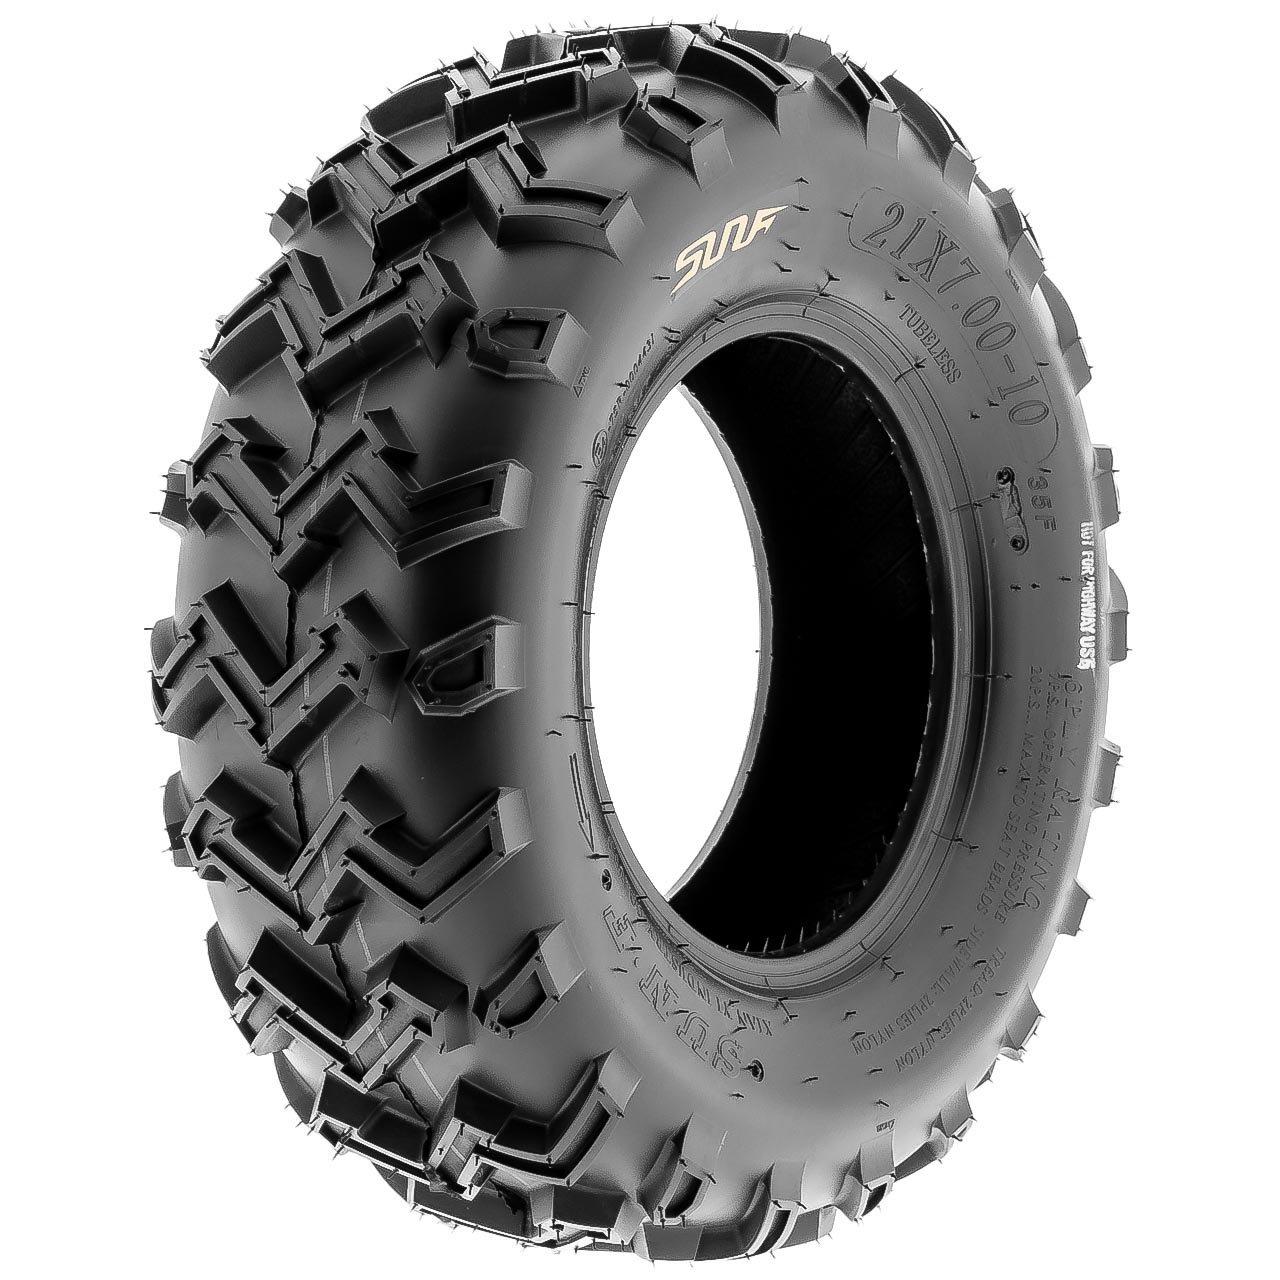 SunF A001 Off-Road ATV/UTV Tire 24x8-12, 6 PR, Directional Tread